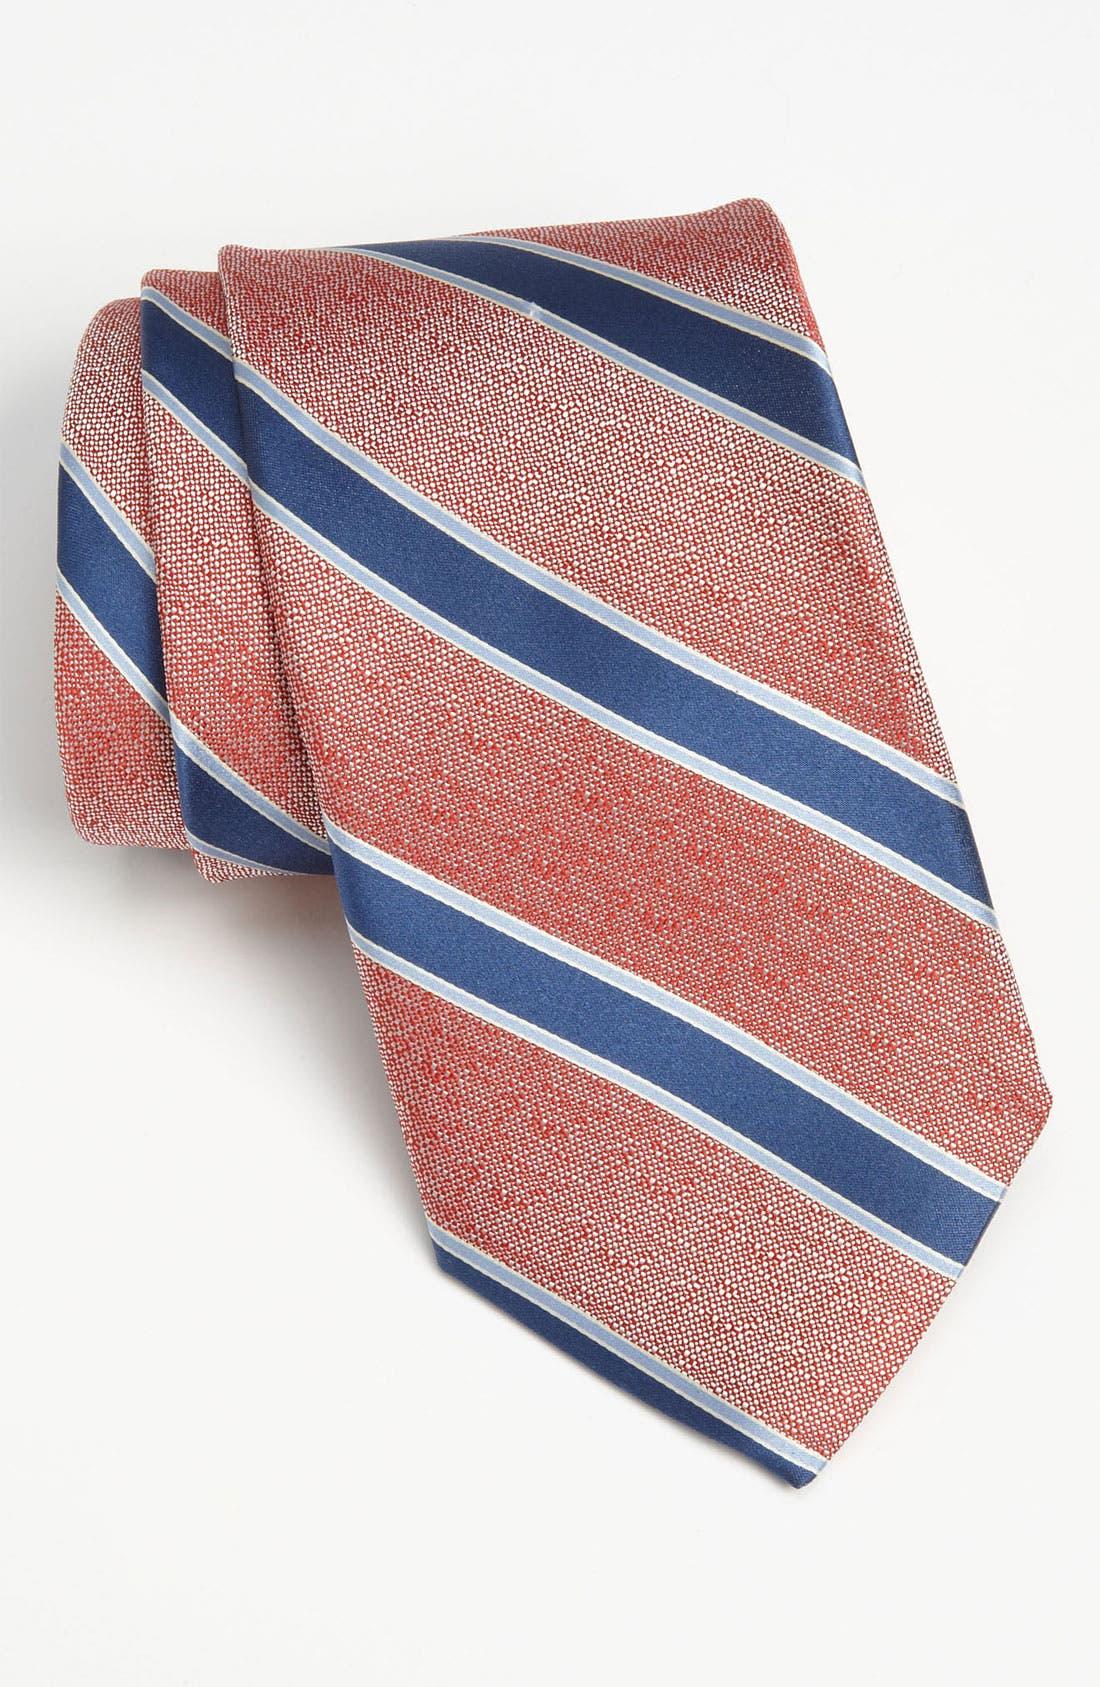 Alternate Image 1 Selected - John W. Nordstrom Woven Silk Tie